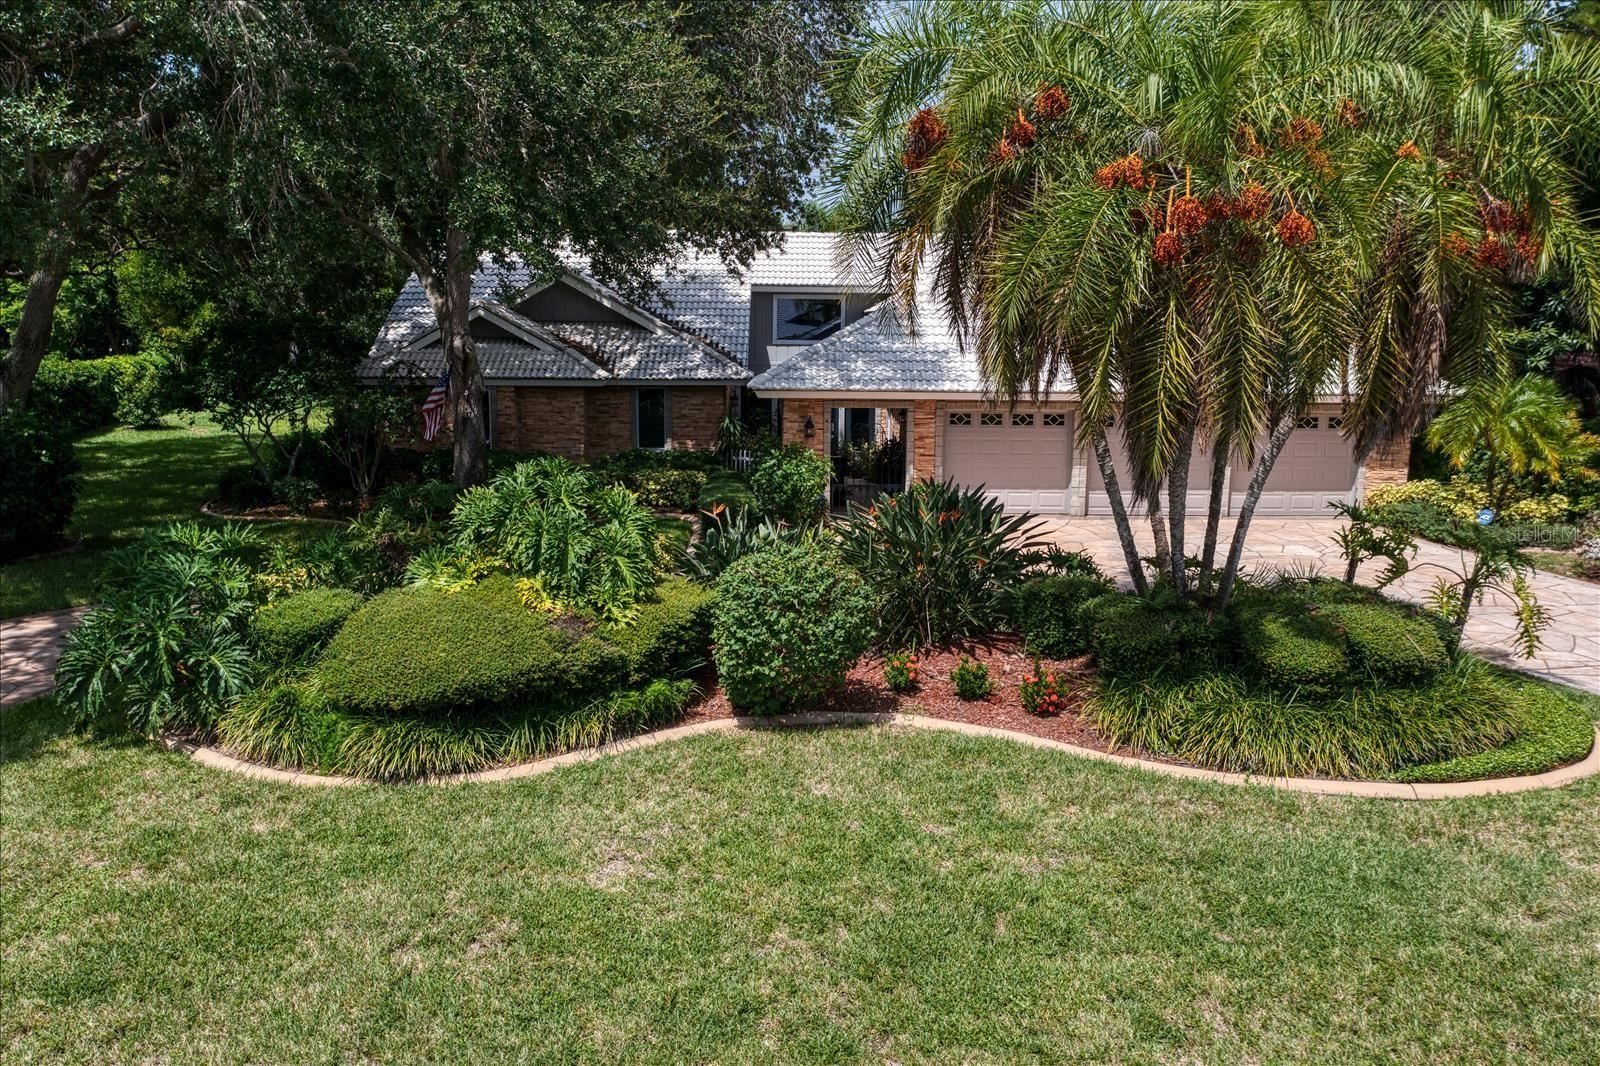 Photo of 2392 LANDINGS CIRCLE, BRADENTON, FL 34209 (MLS # A4513594)